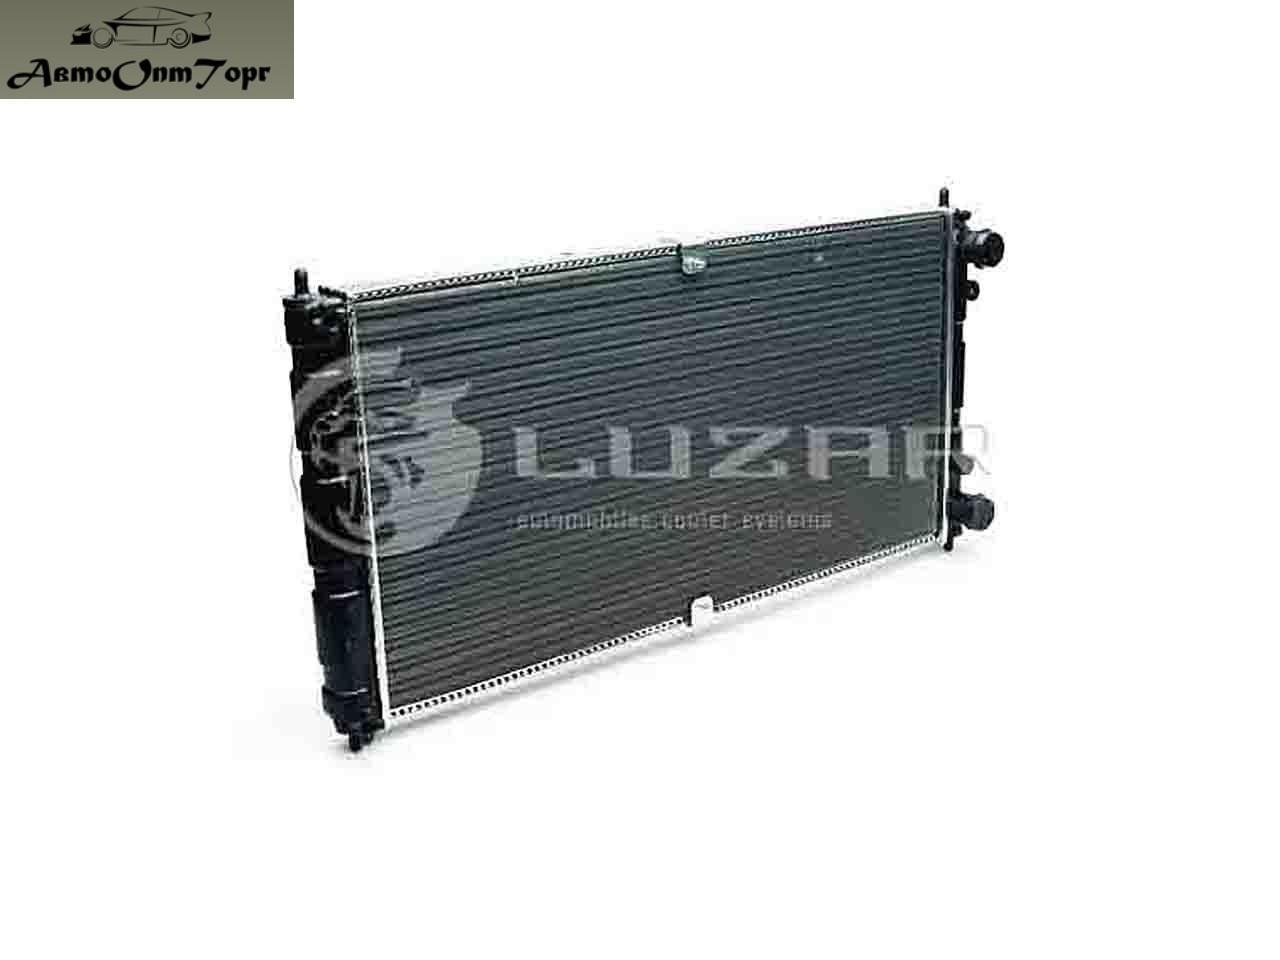 Радиатор охлаждения ВАЗ 2123 Нива-Chevrolet, кат. код: 2123-1301012, произ-во: Лузар LRC 0123